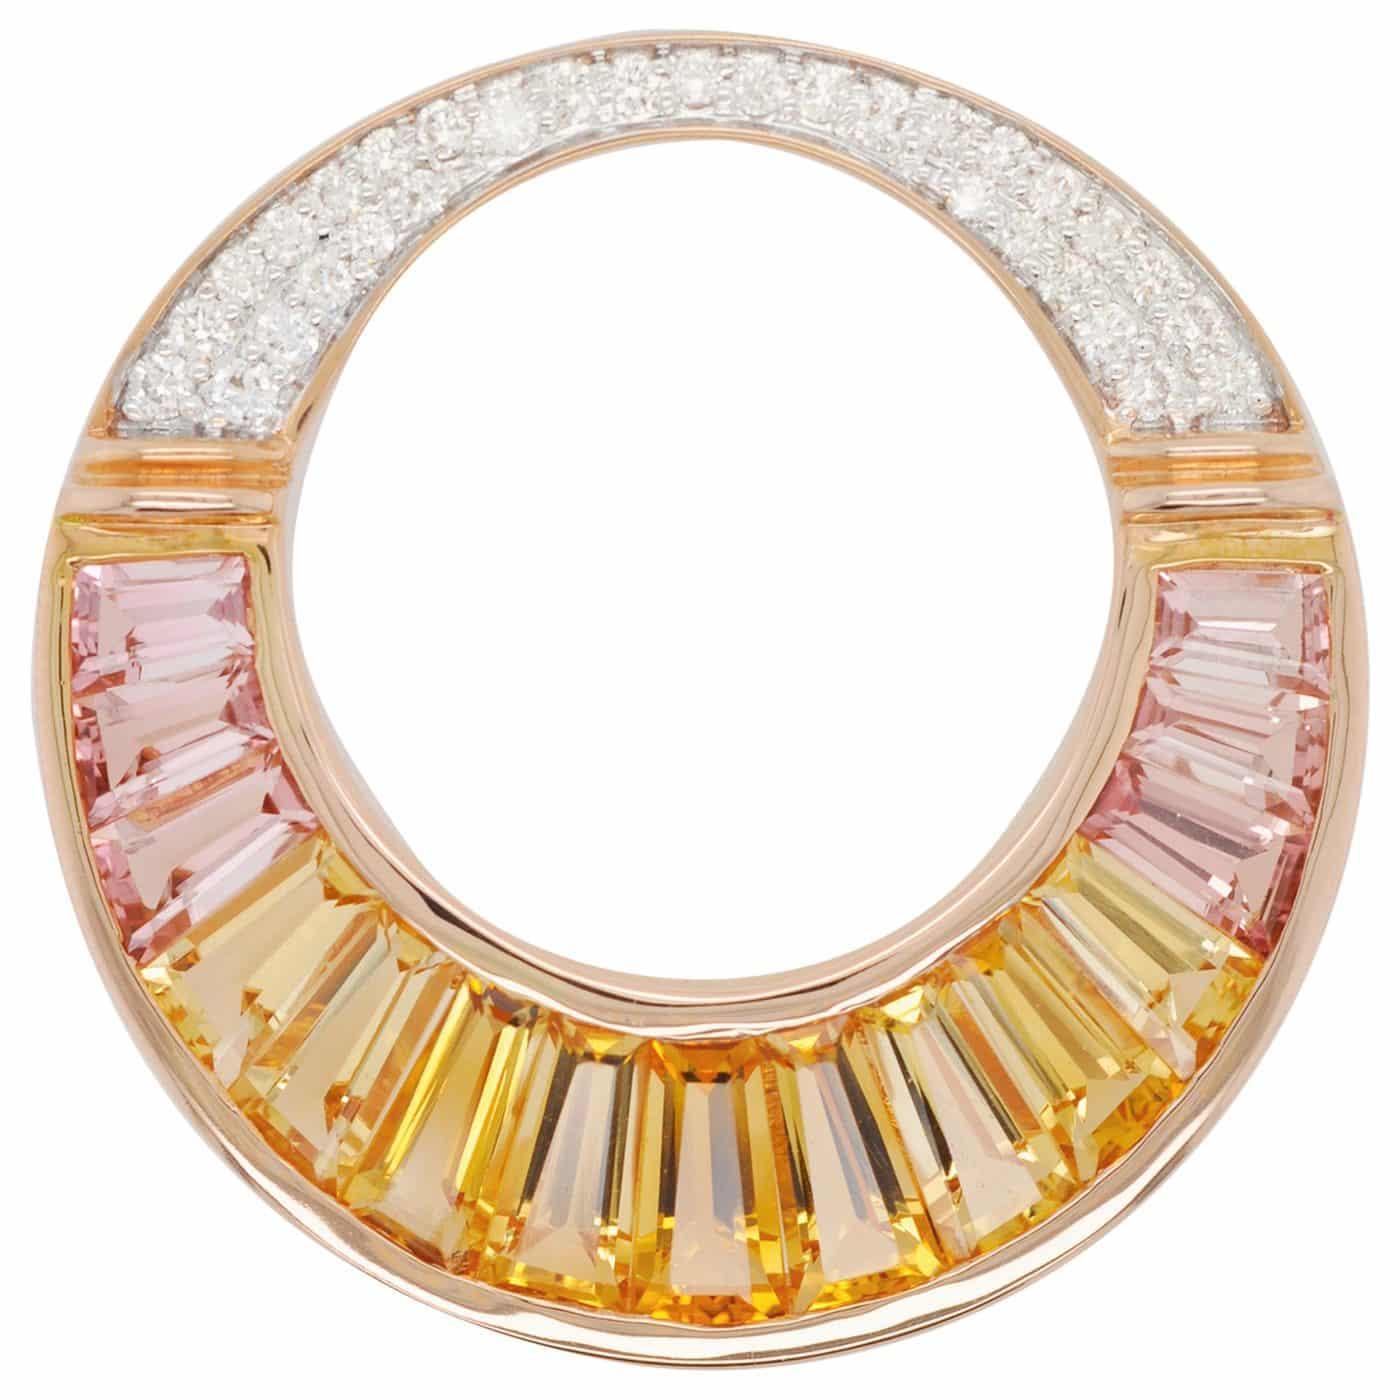 18 Karat Rose Gold Citrine Peach Tourmaline Baguette Diamond Pendant Necklace